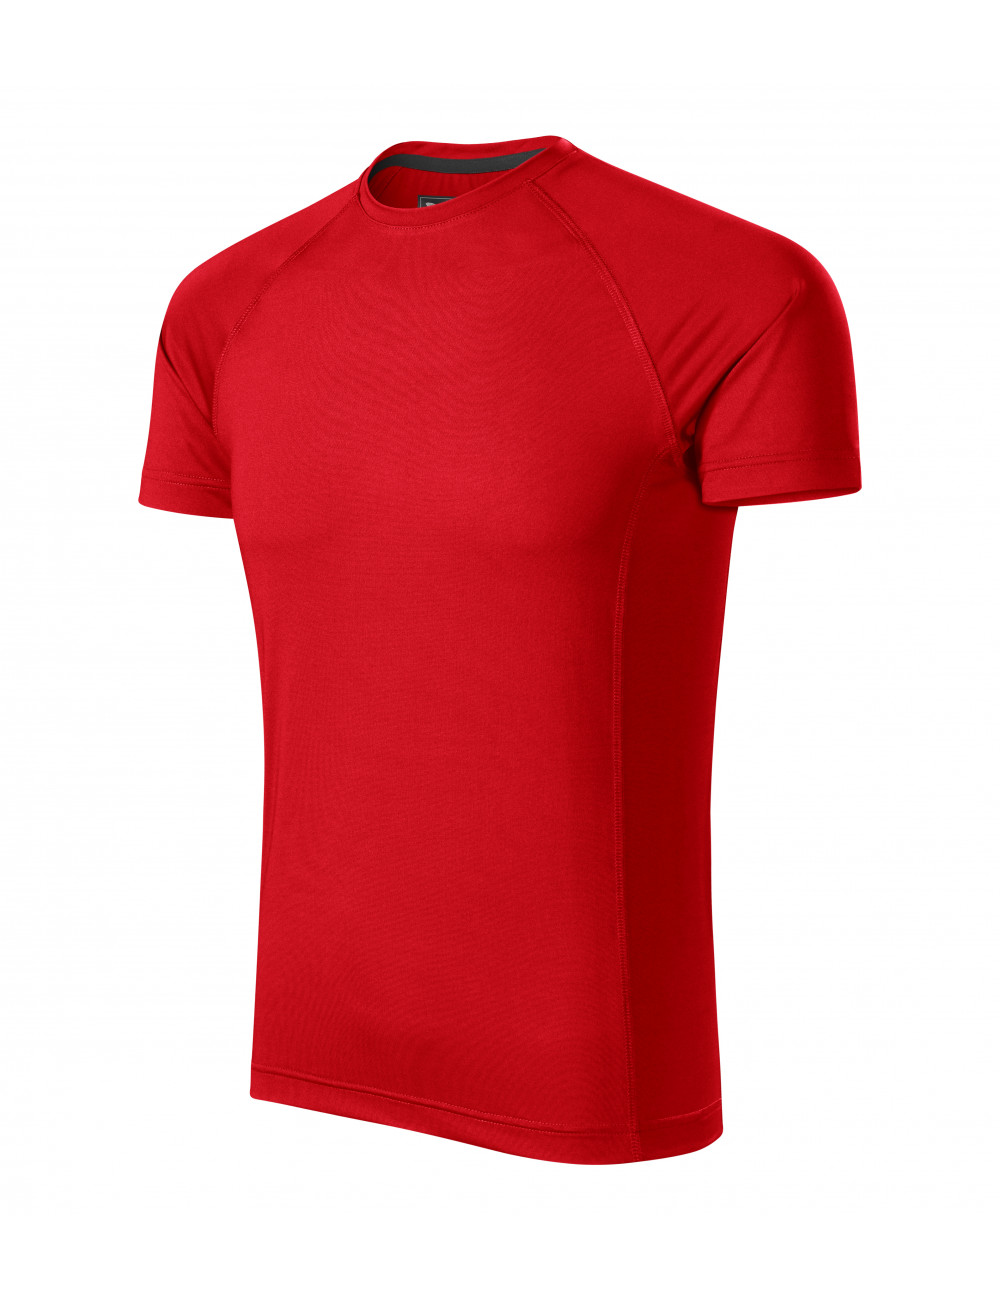 Adler MALFINI Koszulka męska Destiny 175 czerwony